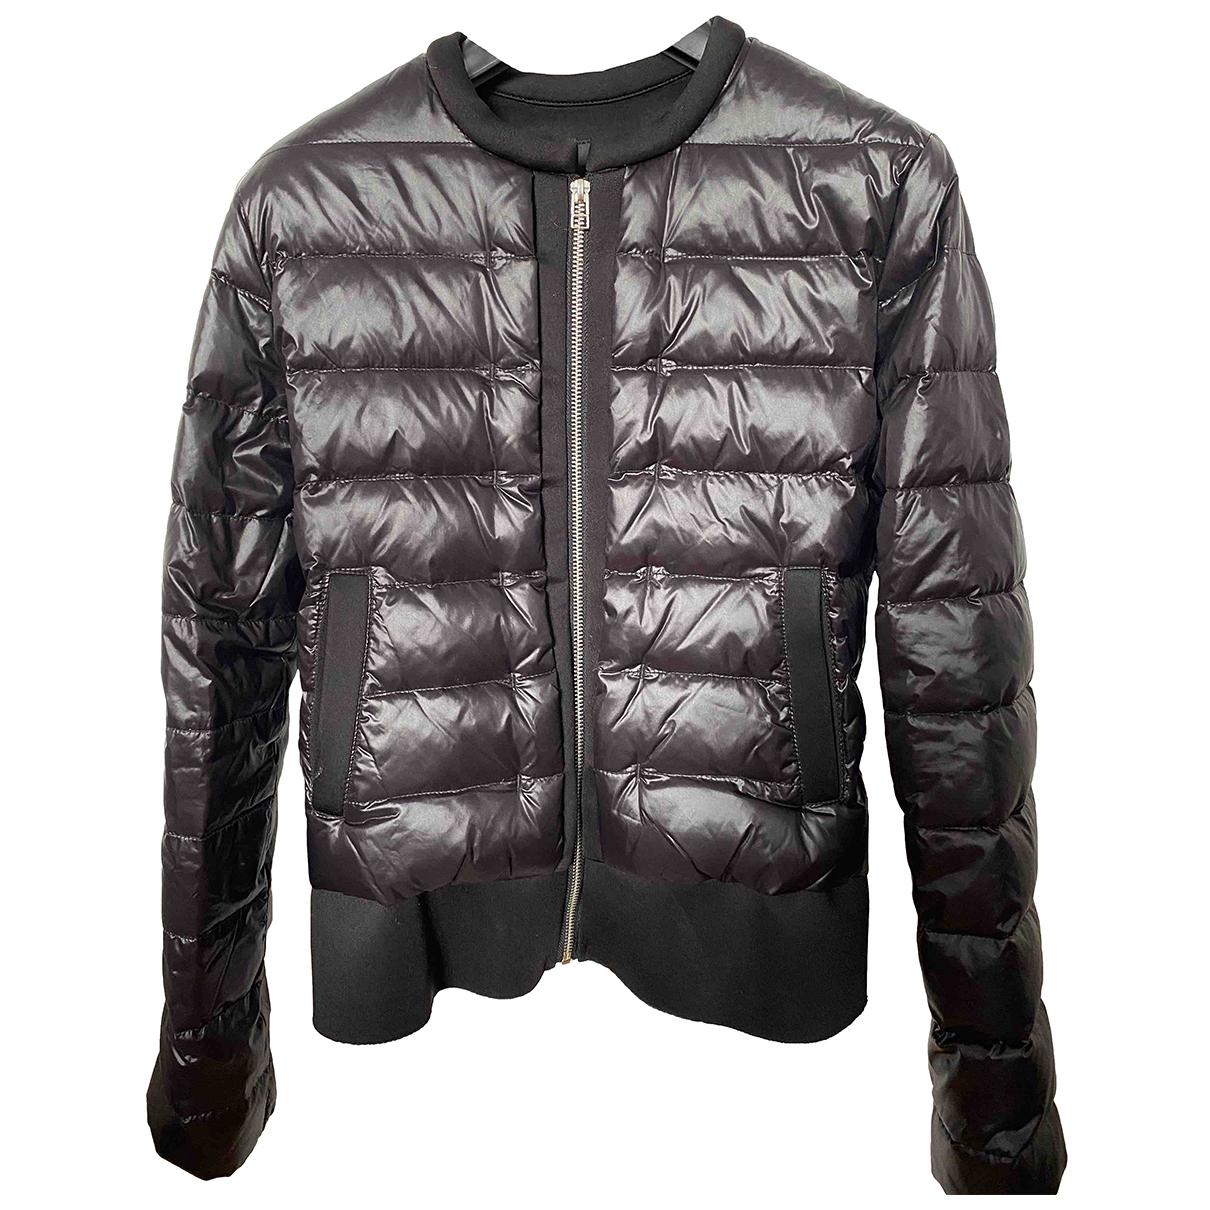 Maje Fall Winter 2019 Black Leather jacket for Women 36 FR